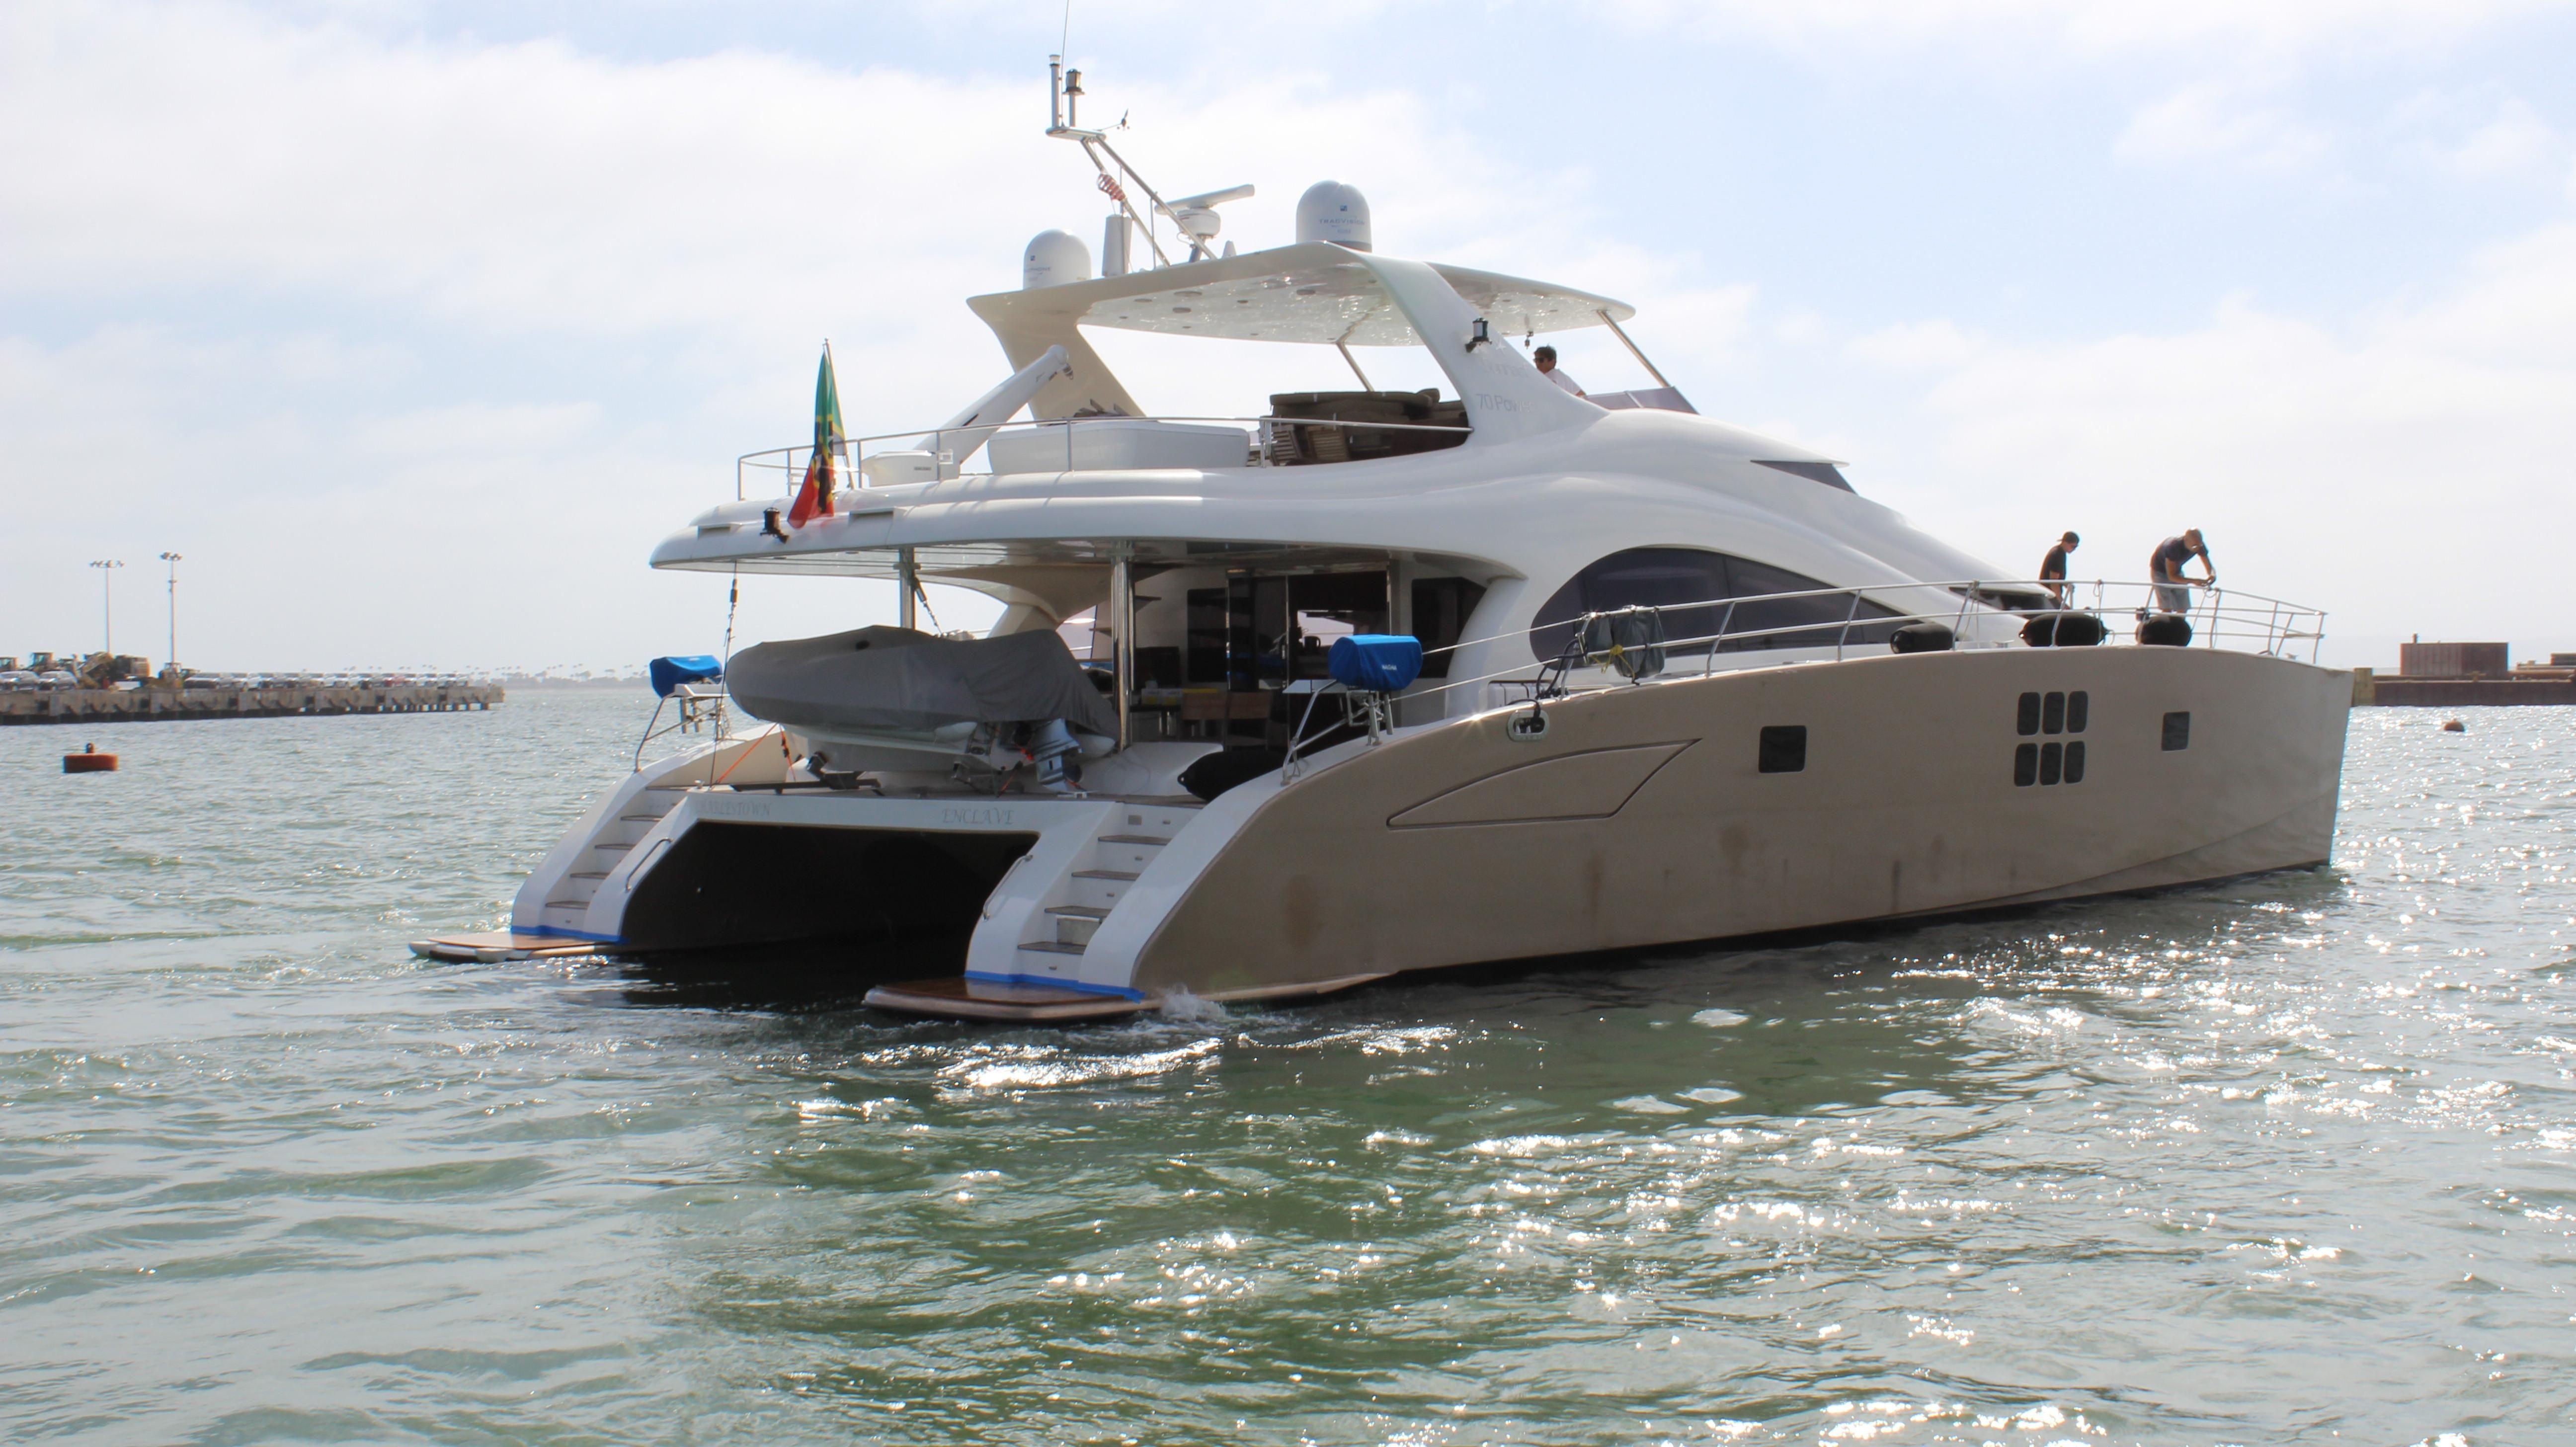 2011 Sunreef 70 Power Catamaran Power Boat For Sale - www ...  2011 Sunreef 70...